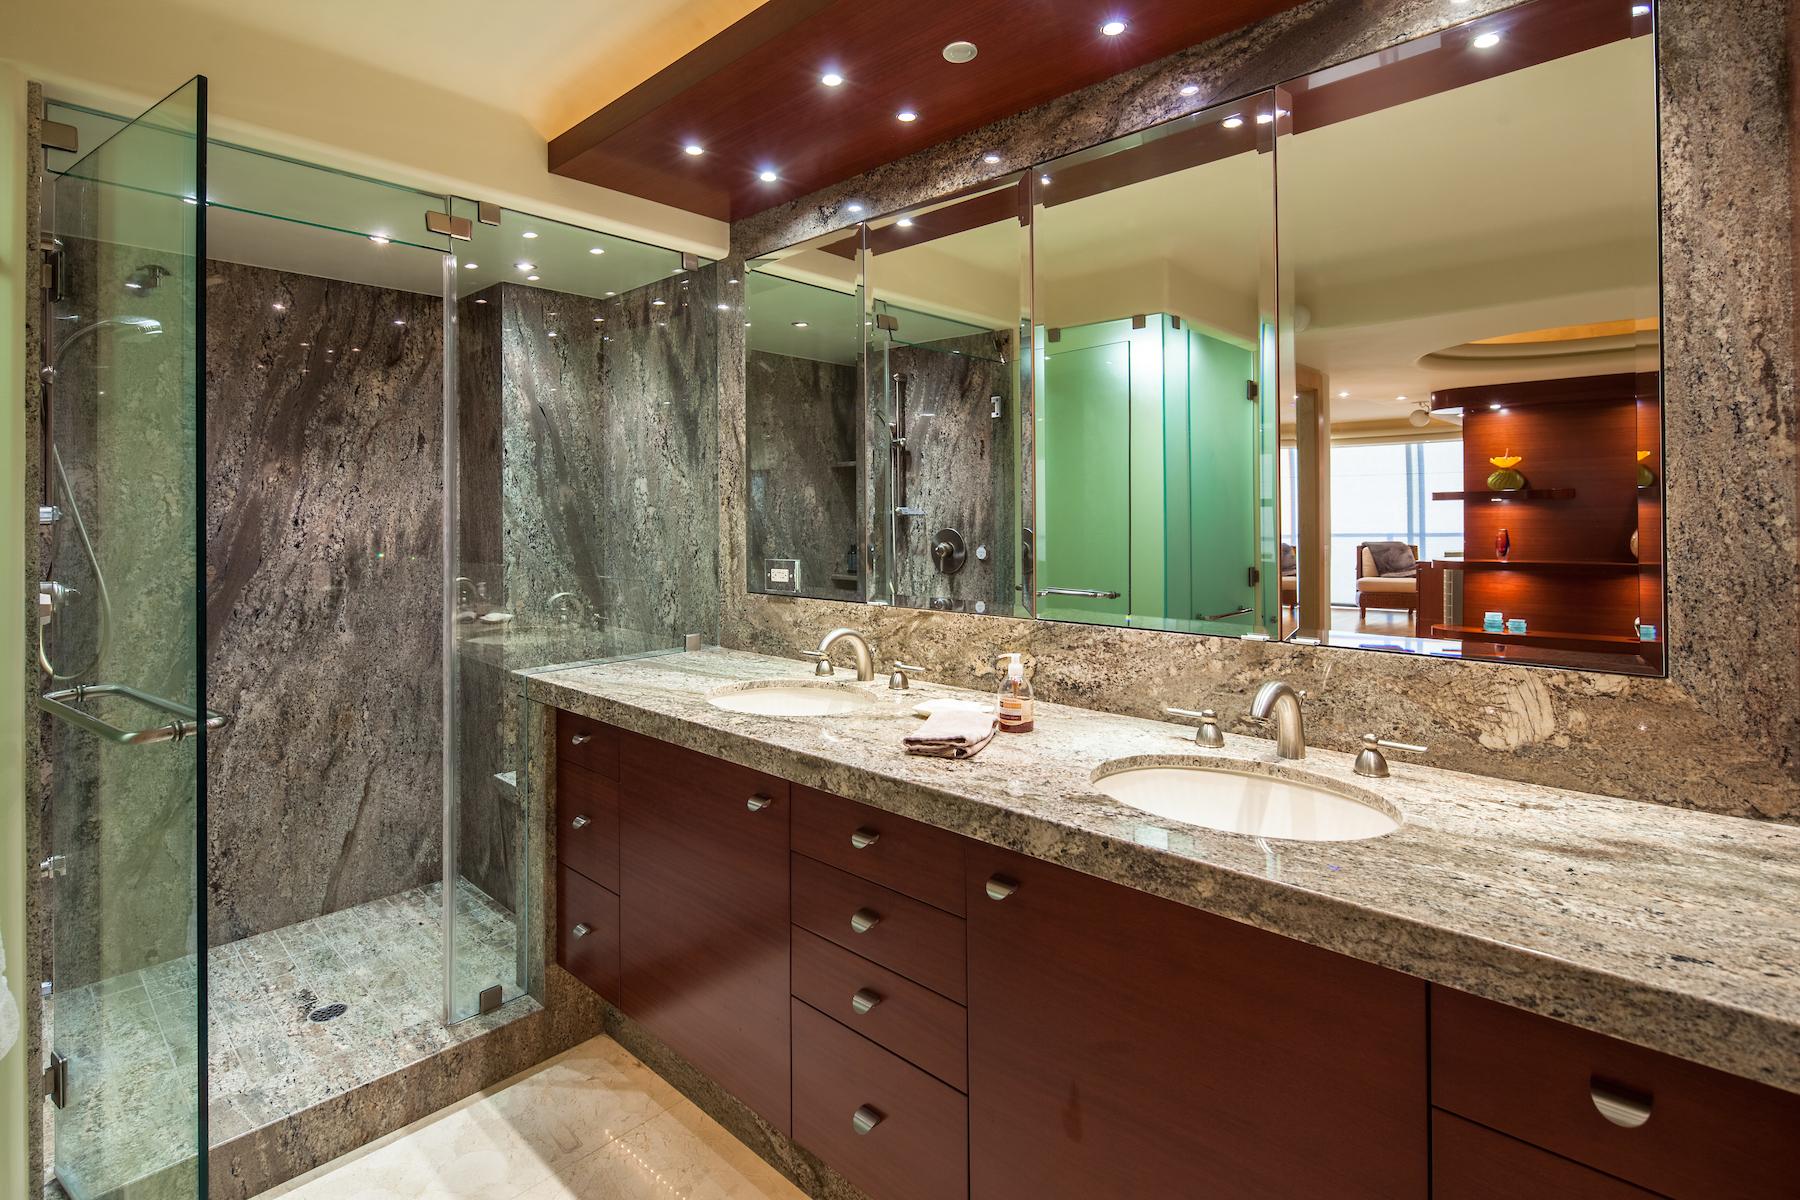 Additional photo for property listing at 1780 Avenida Del Mundo #407  Coronado, Californie 92118 États-Unis